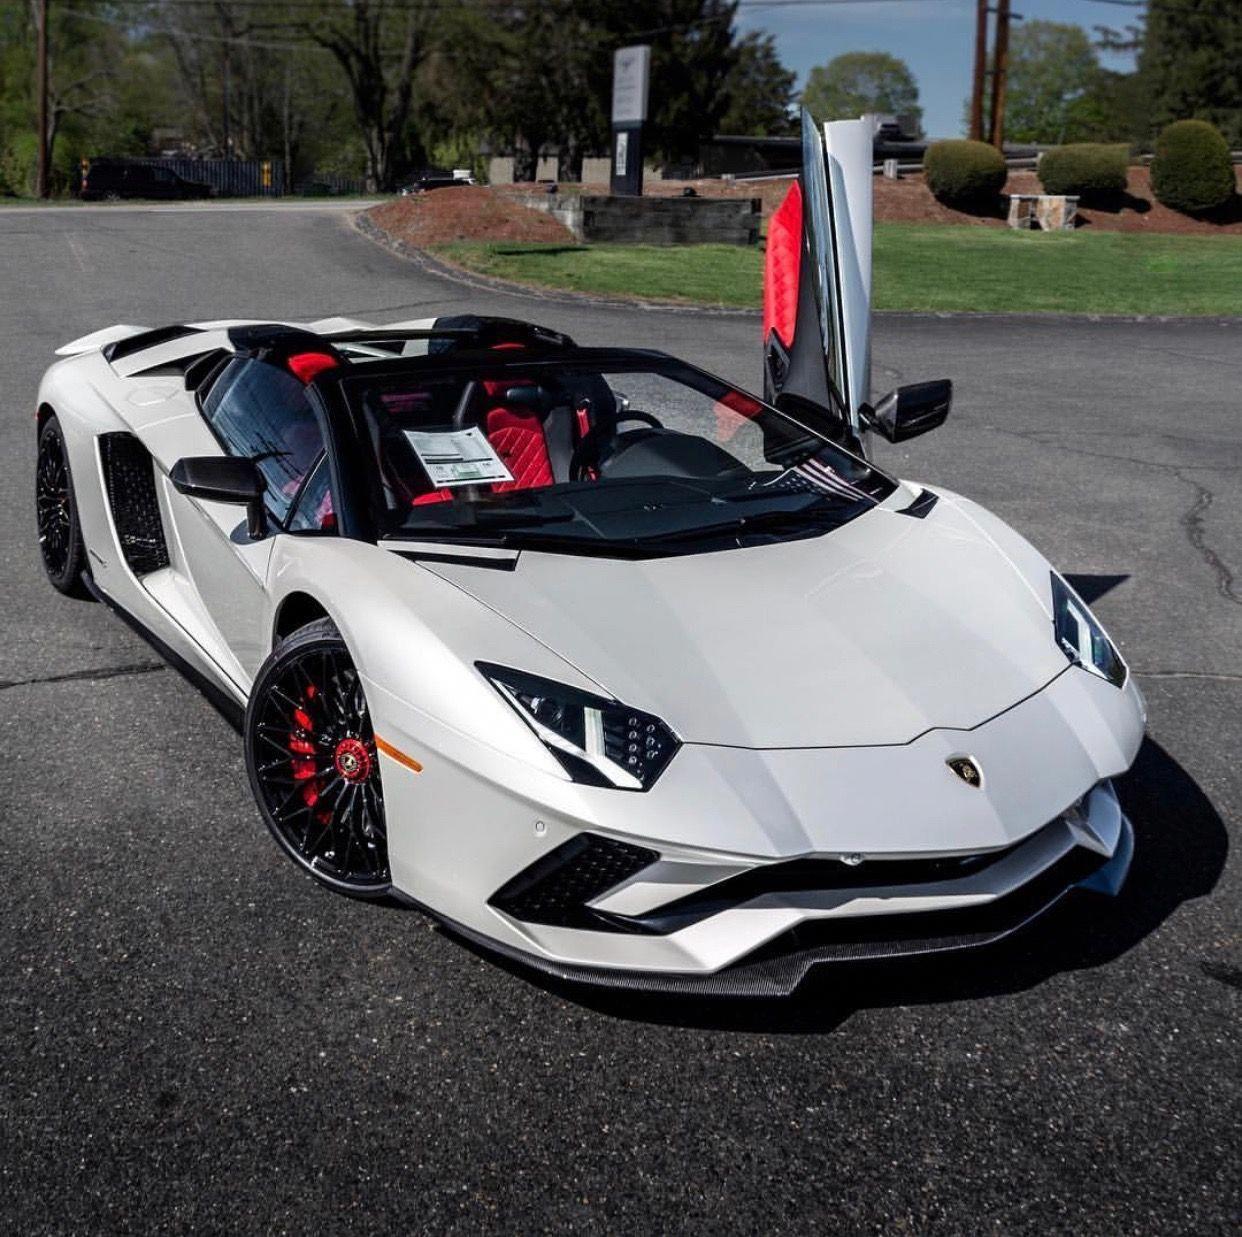 Lamborghini Aventador S Roadster Painted In Balloon White Photo